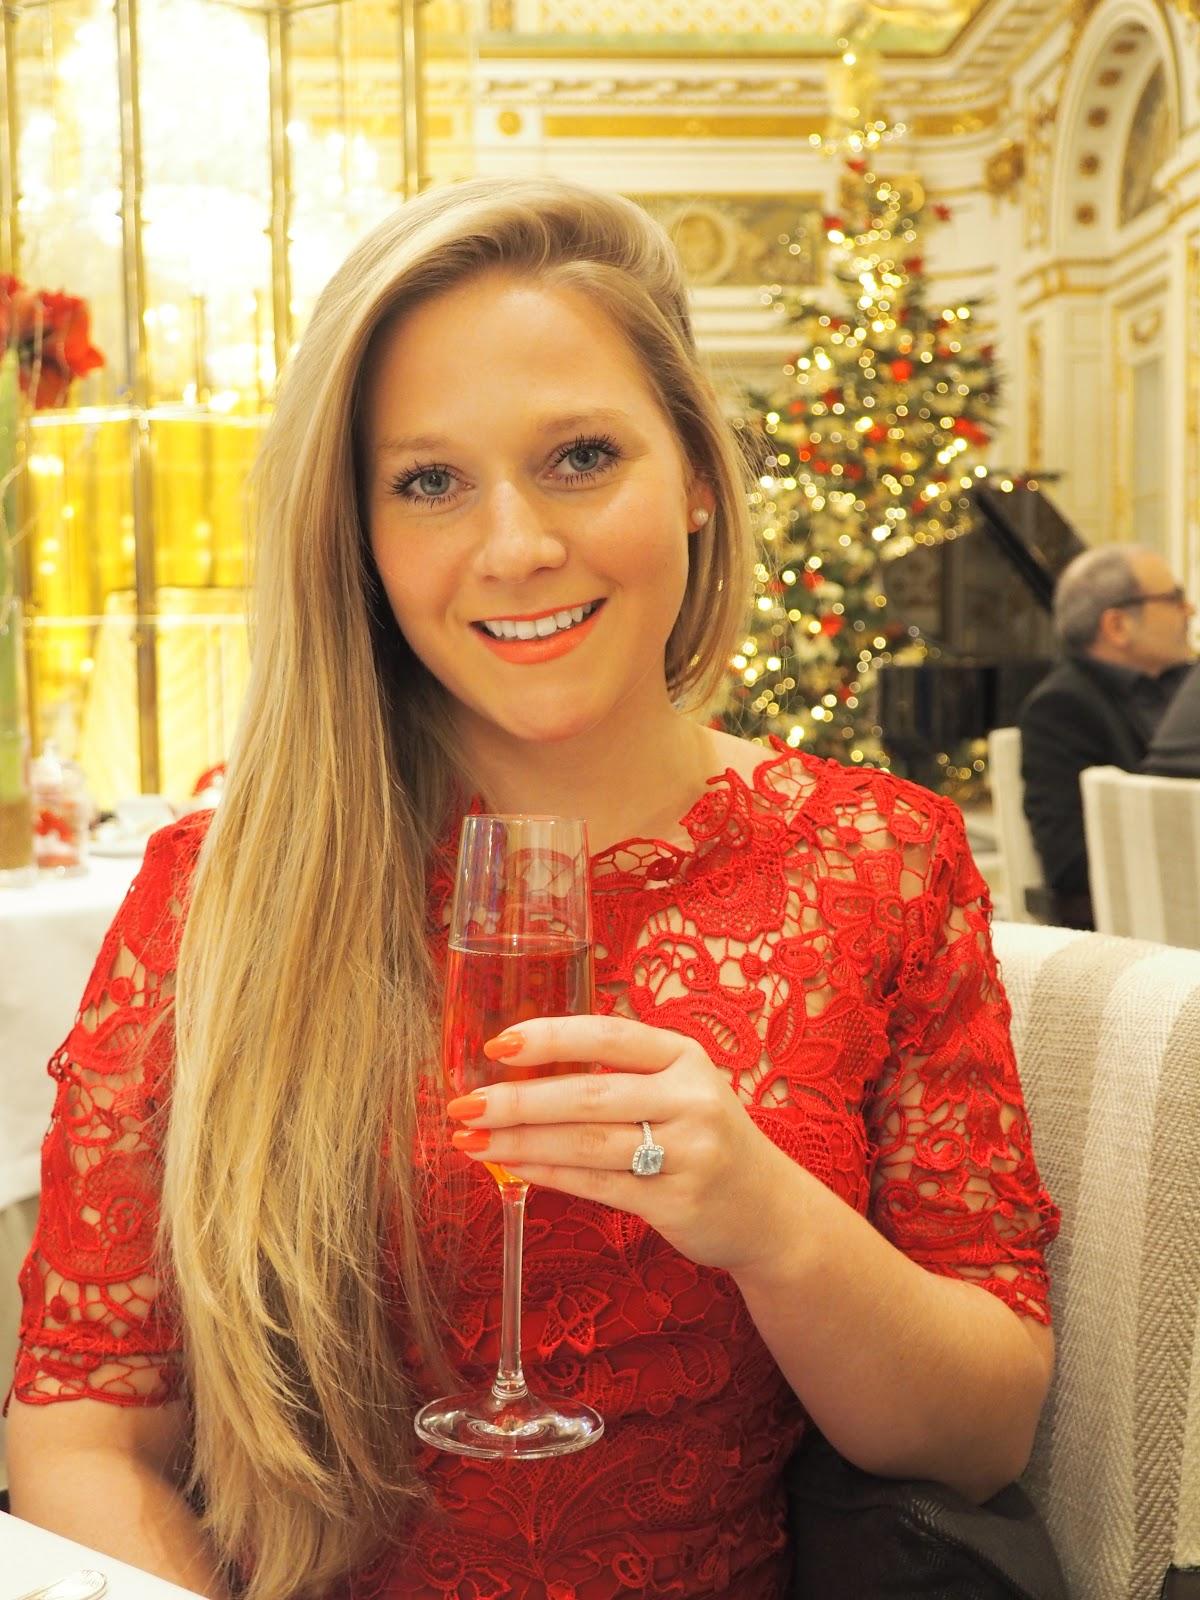 Peninsula Hotel, Paris, Afternoon Tea, Katie Matthews, Blonde girl wearing red dress sipping champagne